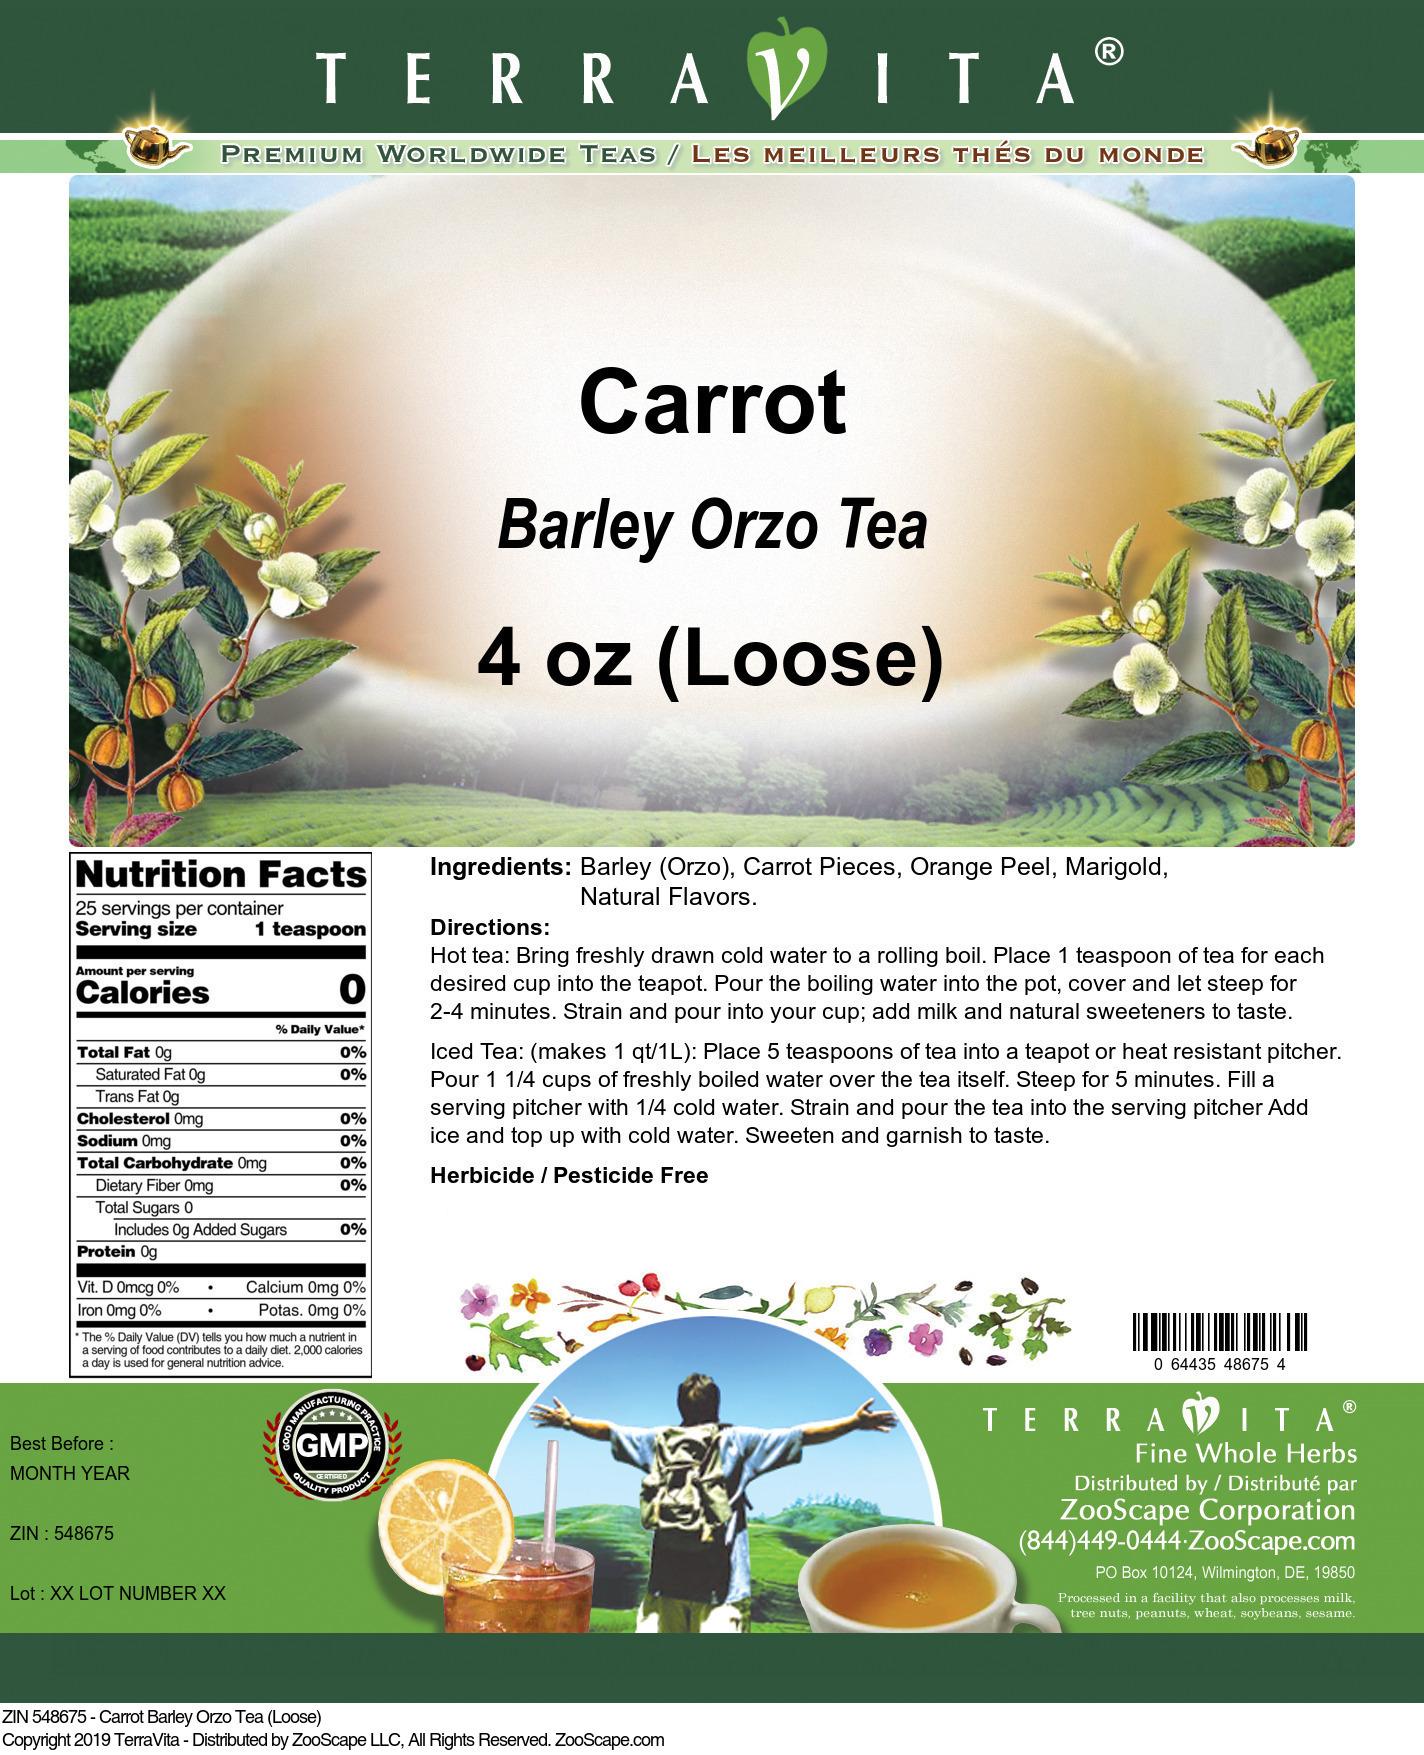 Carrot Barley Orzo Tea (Loose)